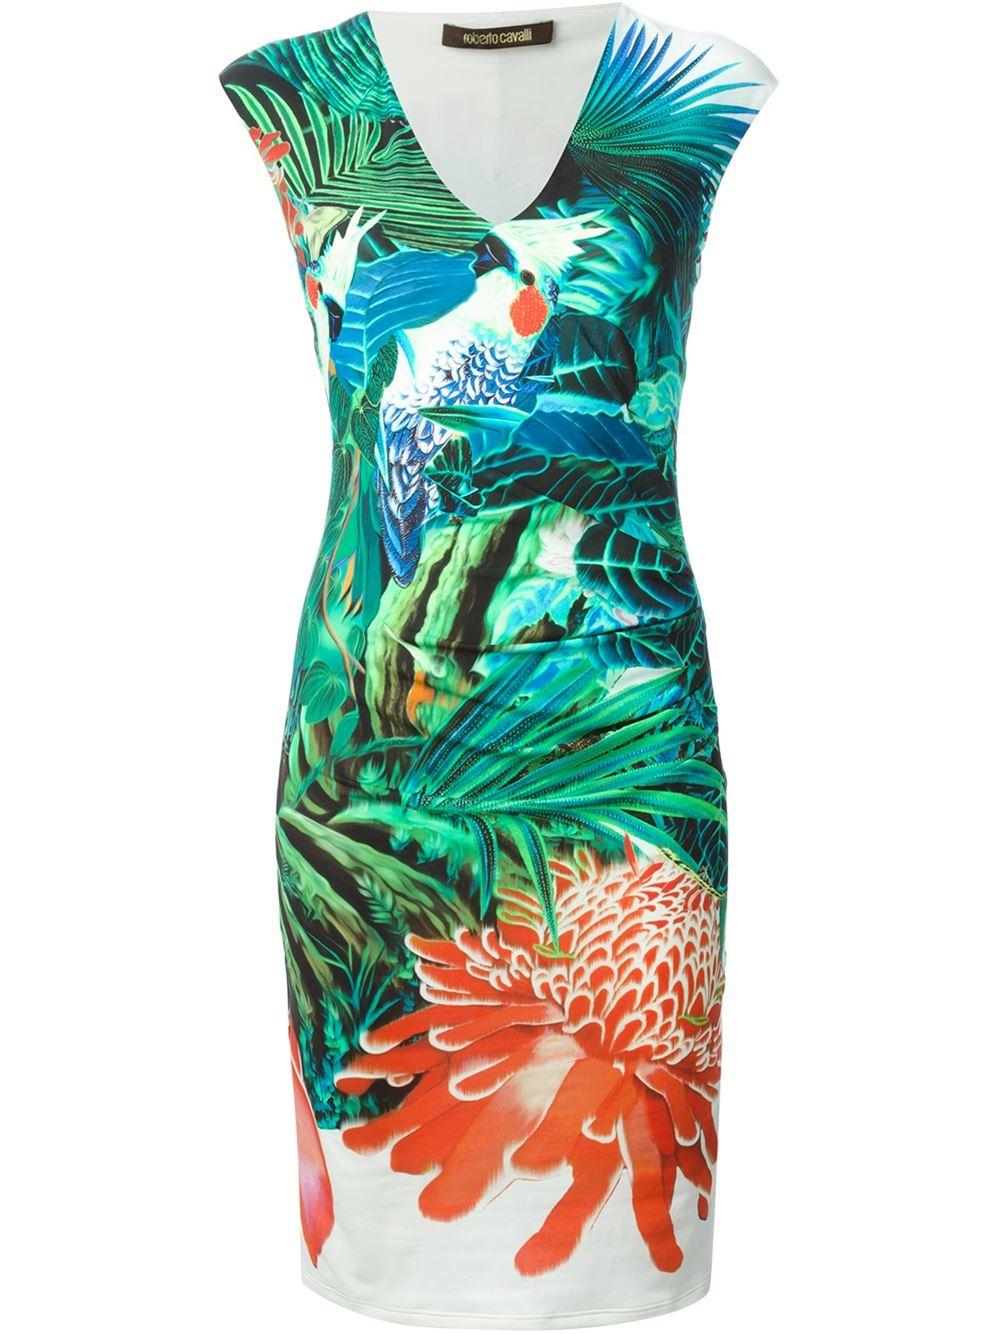 Lyst - Roberto Cavalli Tropical Print Dress in Blue ffc00d092